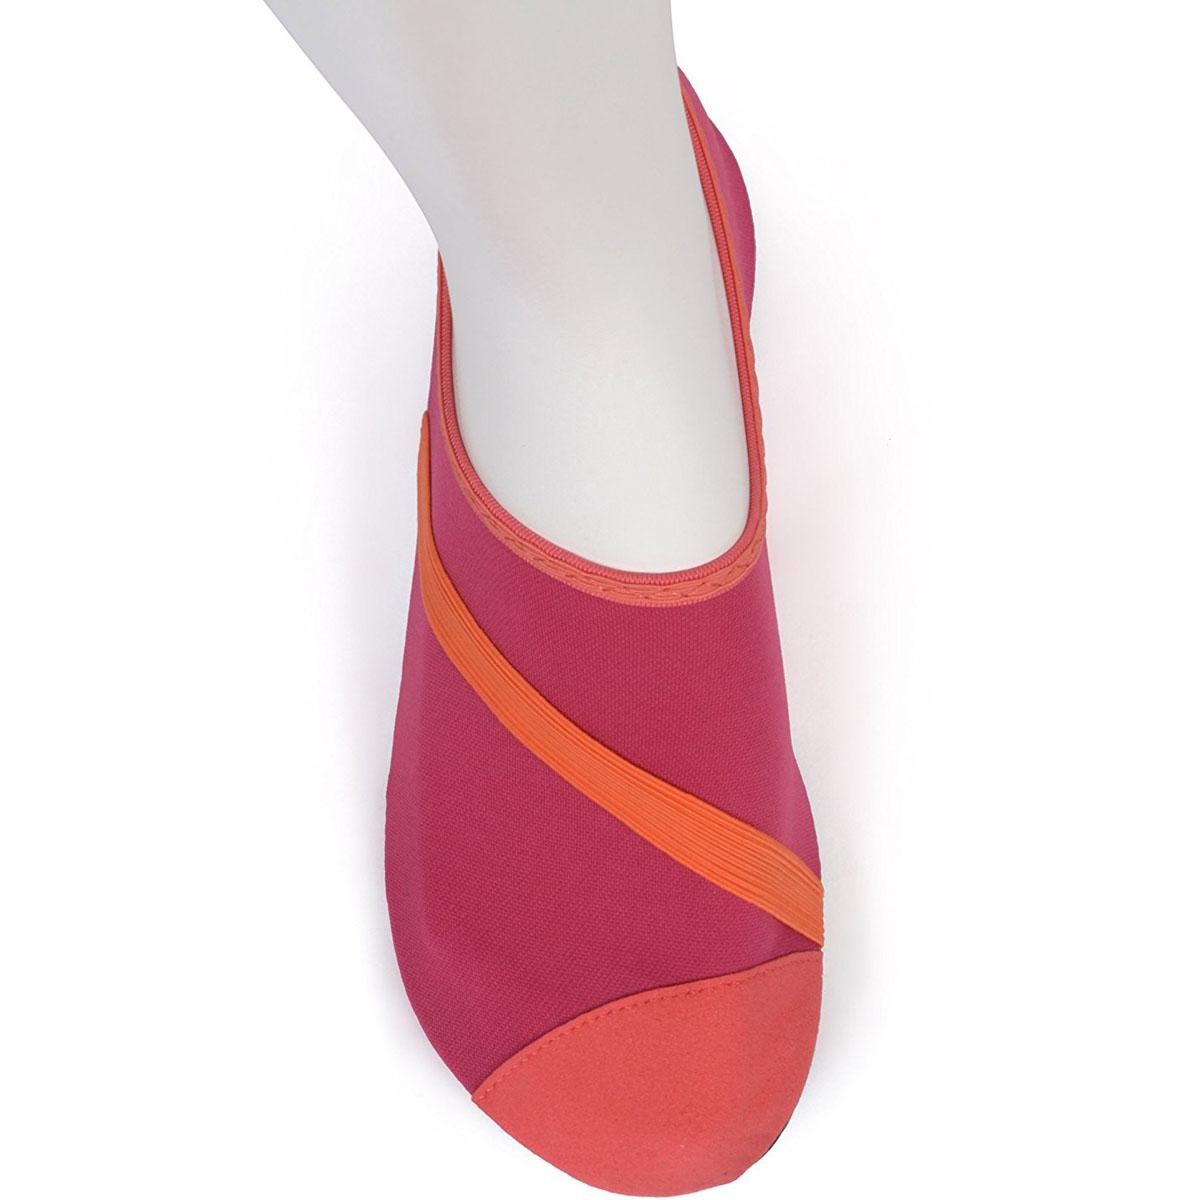 FitKicks-Women-039-s-Non-Slip-Sole-Active-Footwear thumbnail 19